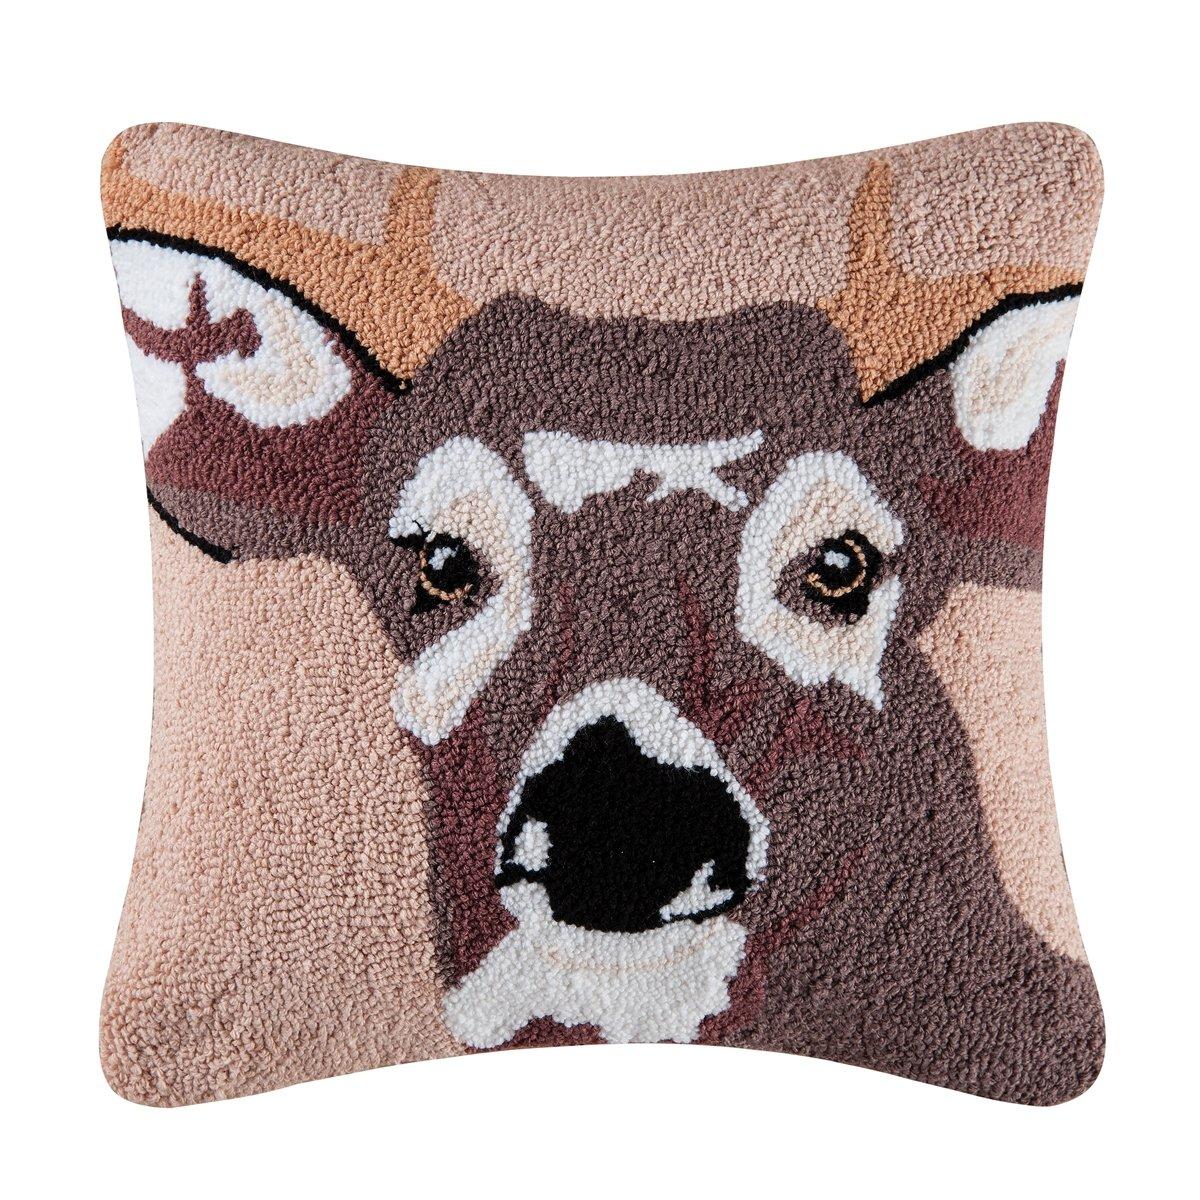 C&F Home in the Woods Deer Pillow, Brown